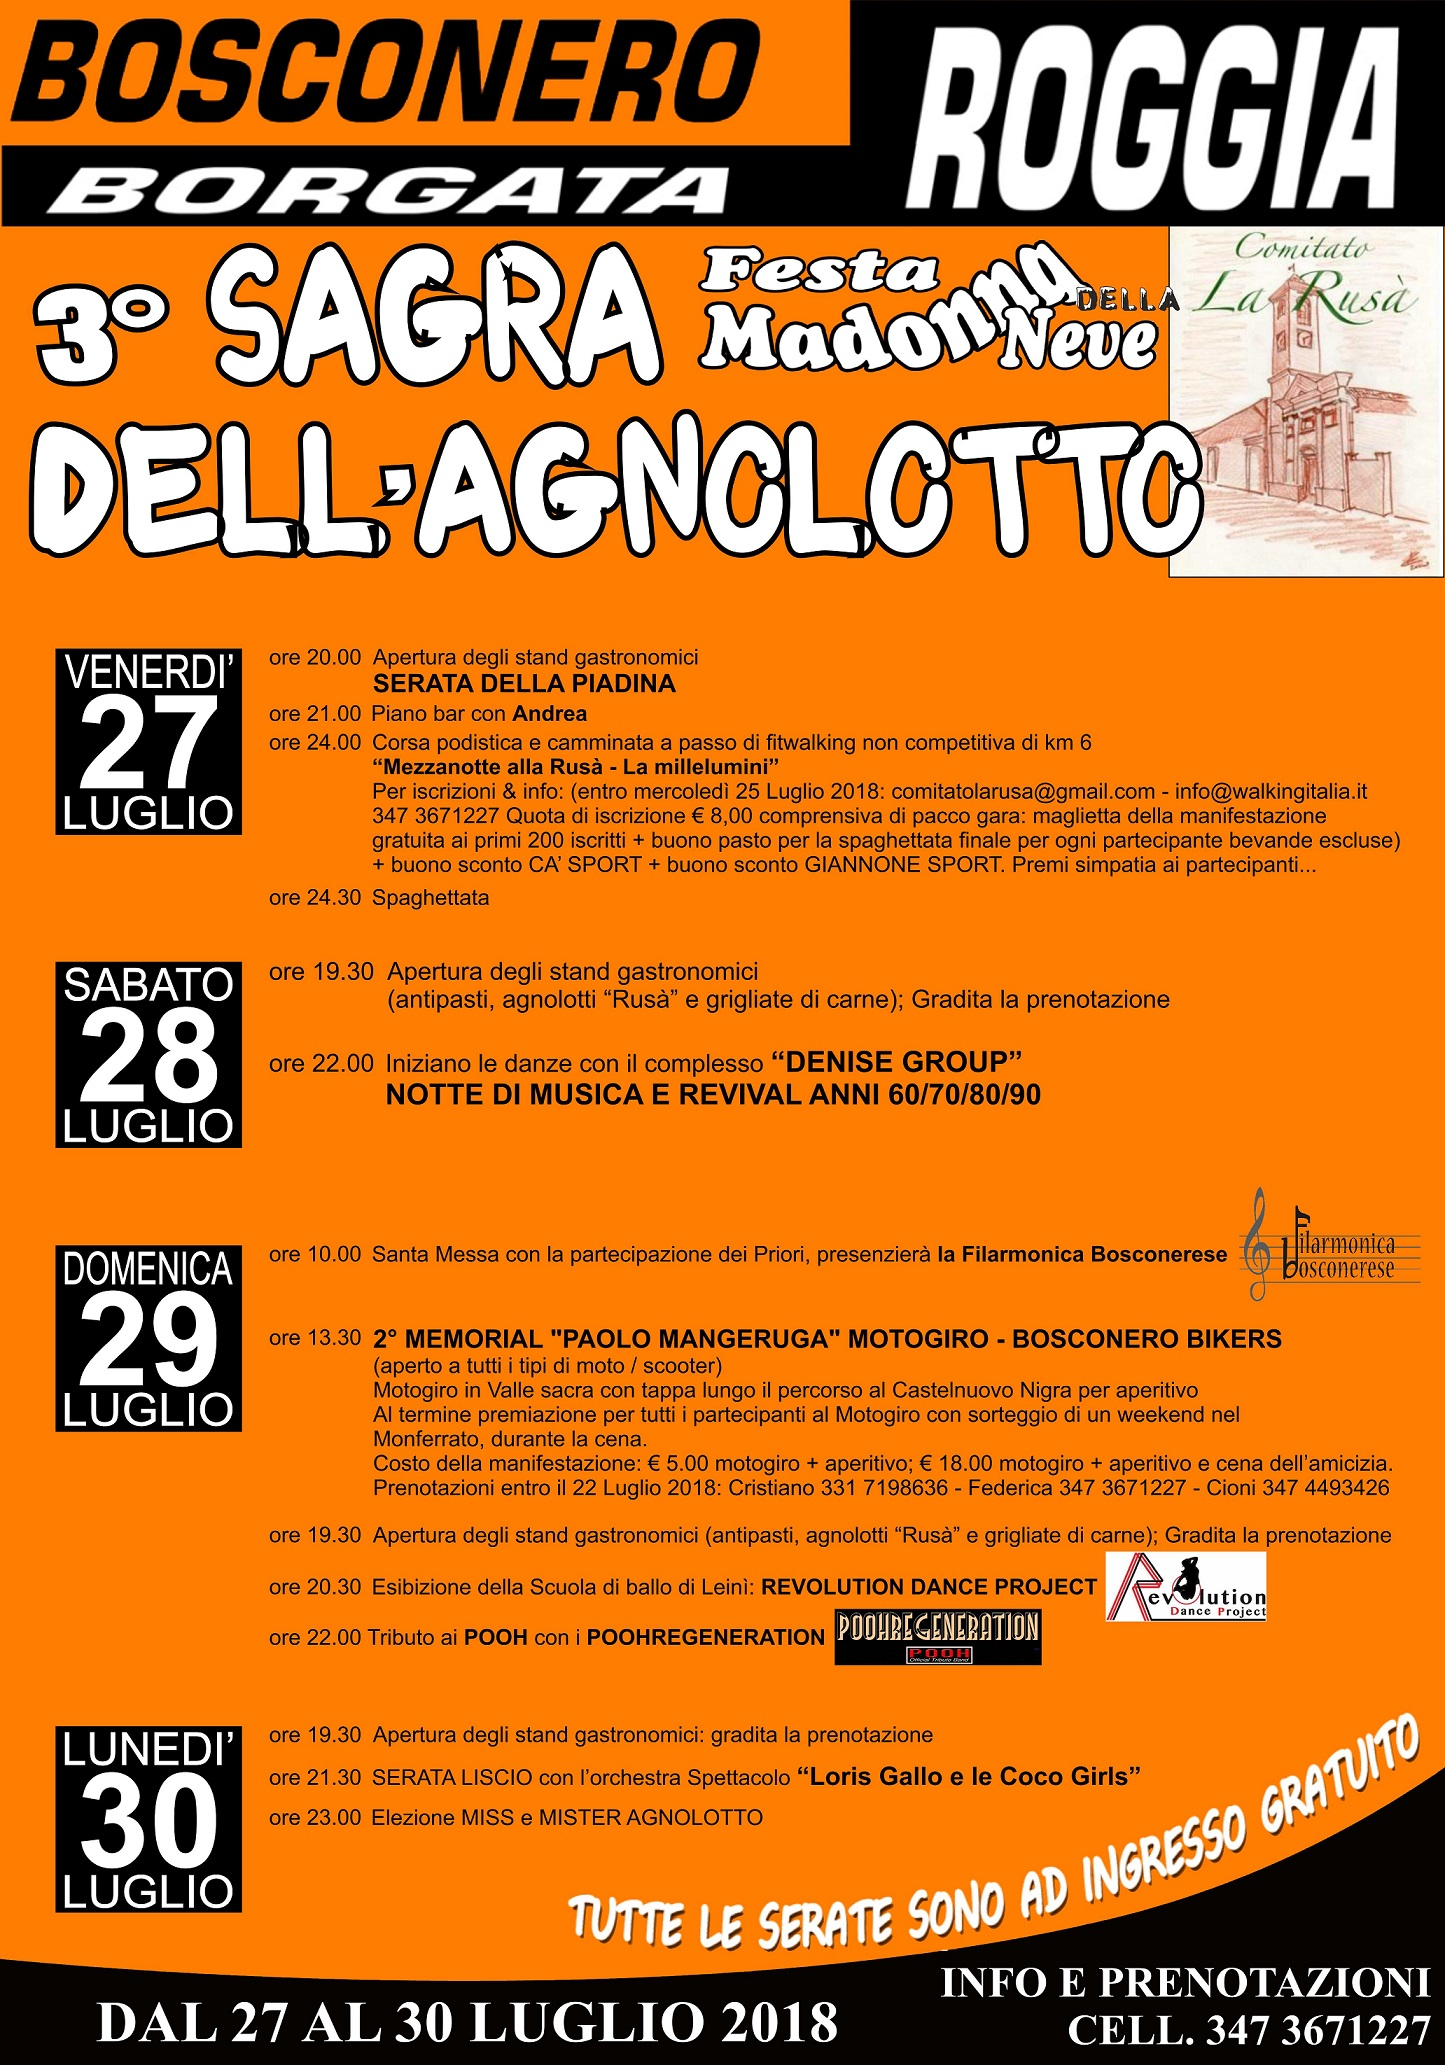 Bosconero_sagraagnolotto_manifesto